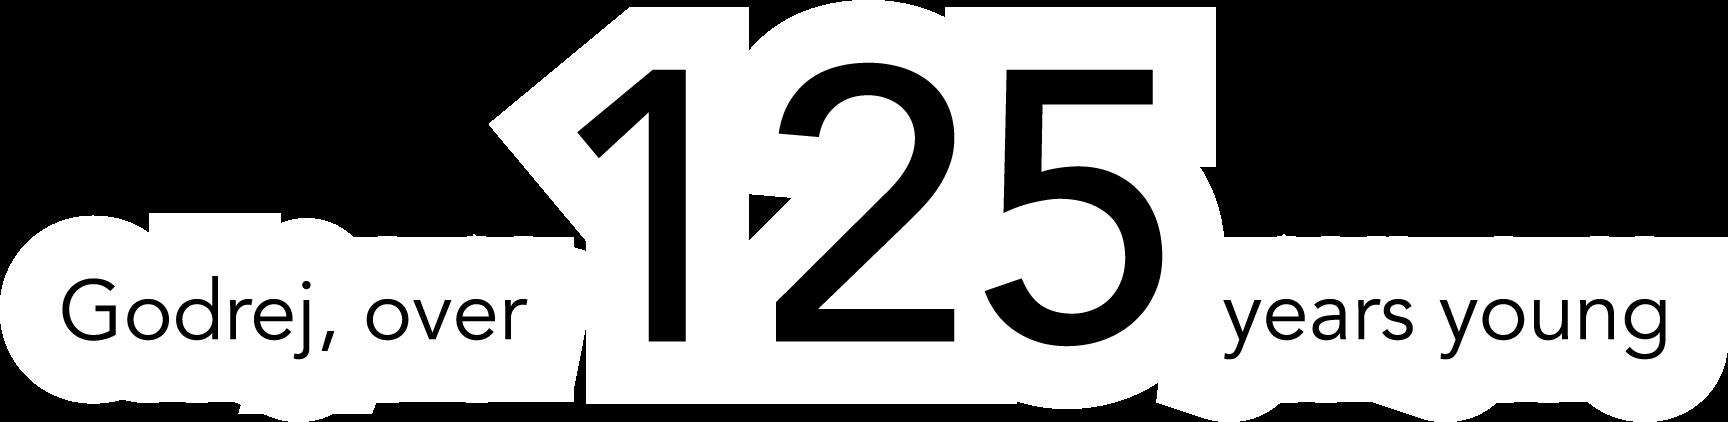 123 years